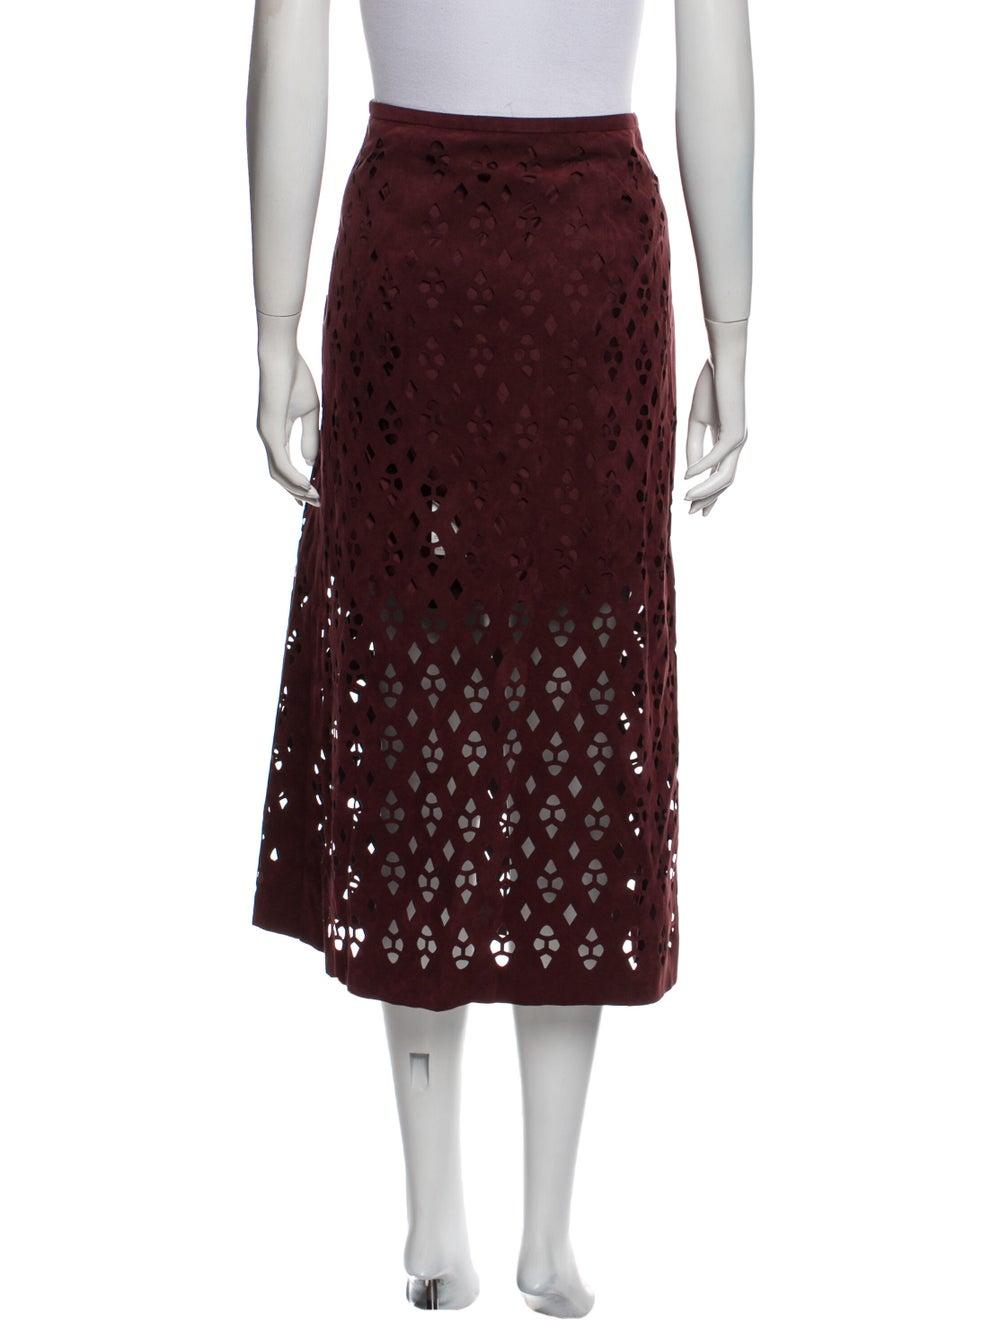 Tibi Patterned Midi Length Skirt - image 3